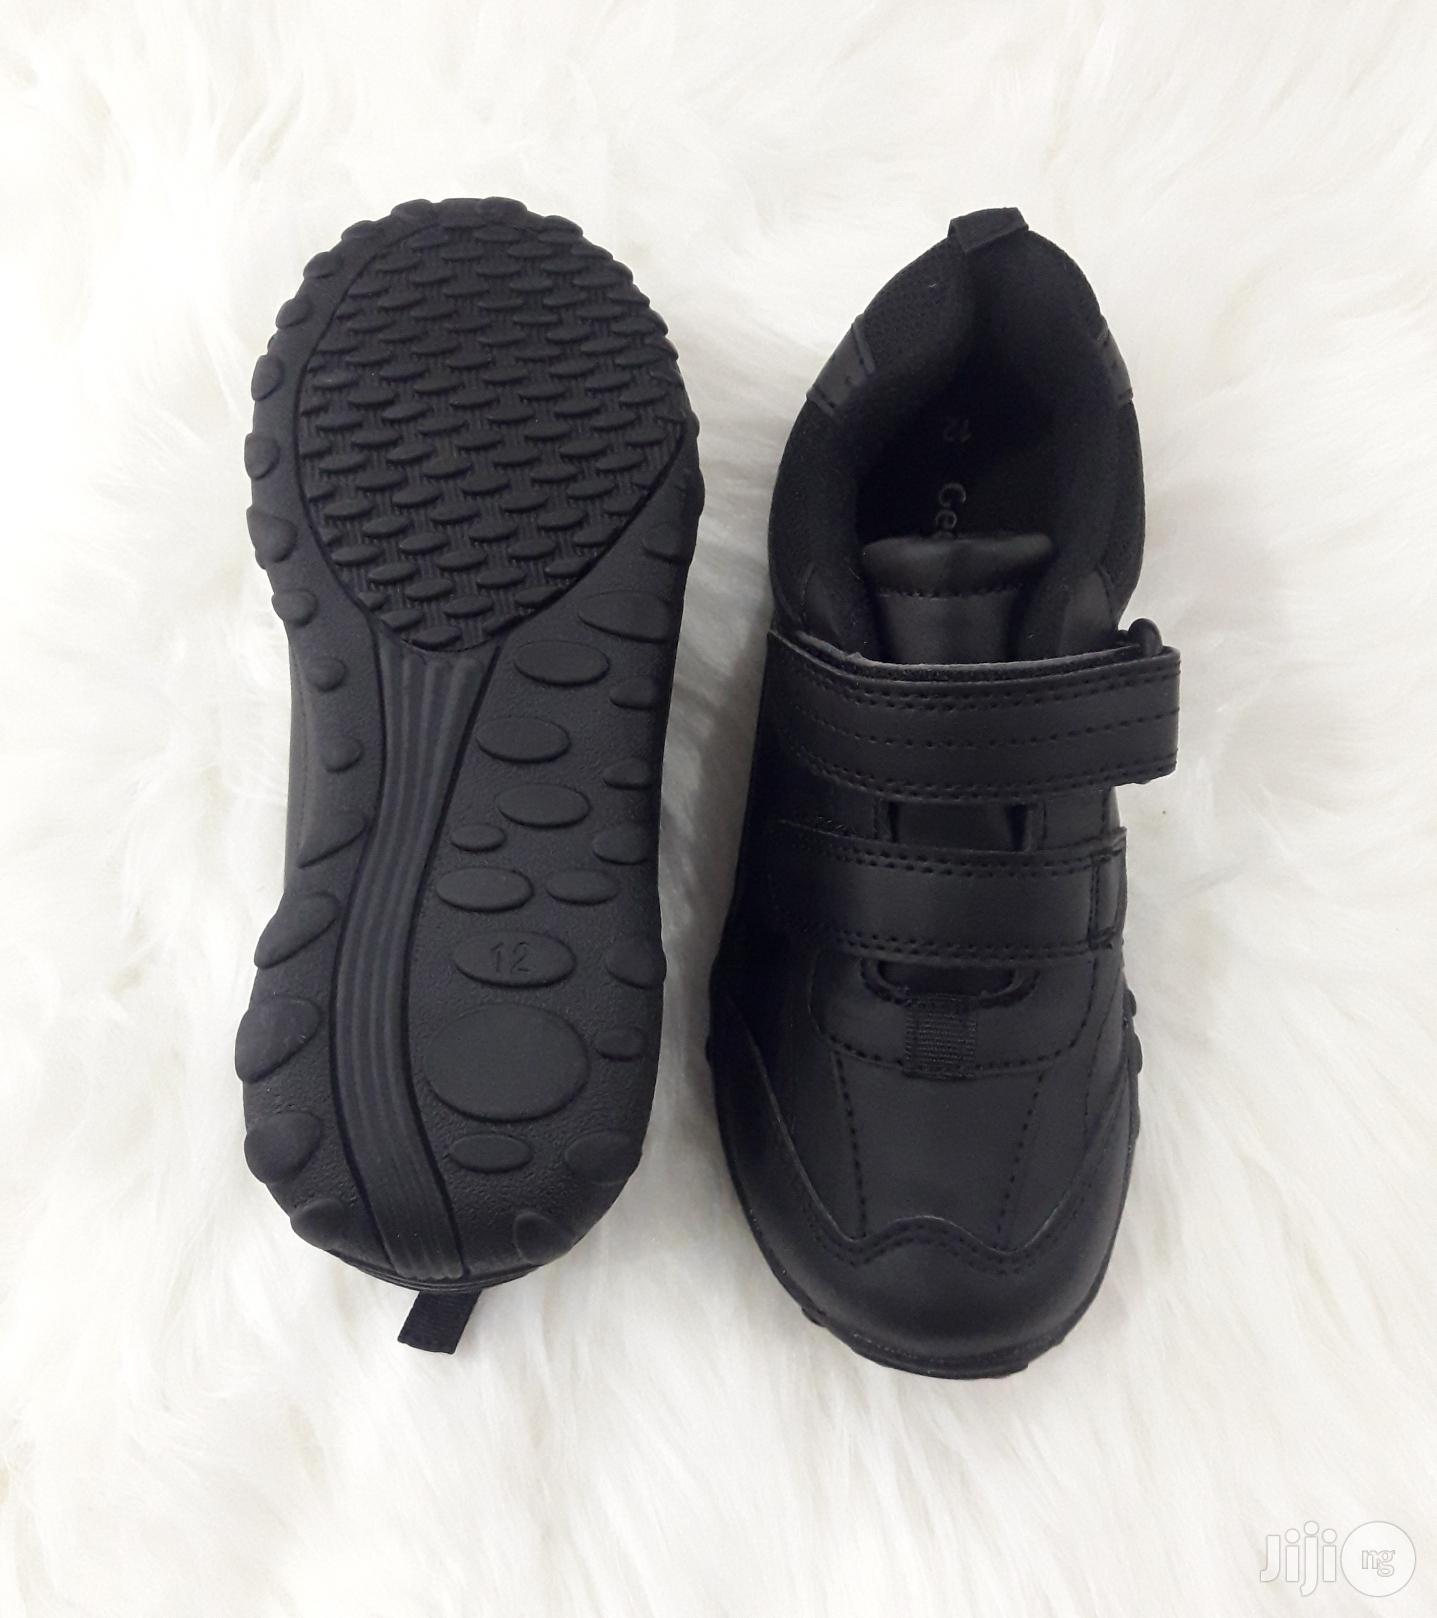 School Shoe | Children's Shoes for sale in Lekki, Lagos State, Nigeria